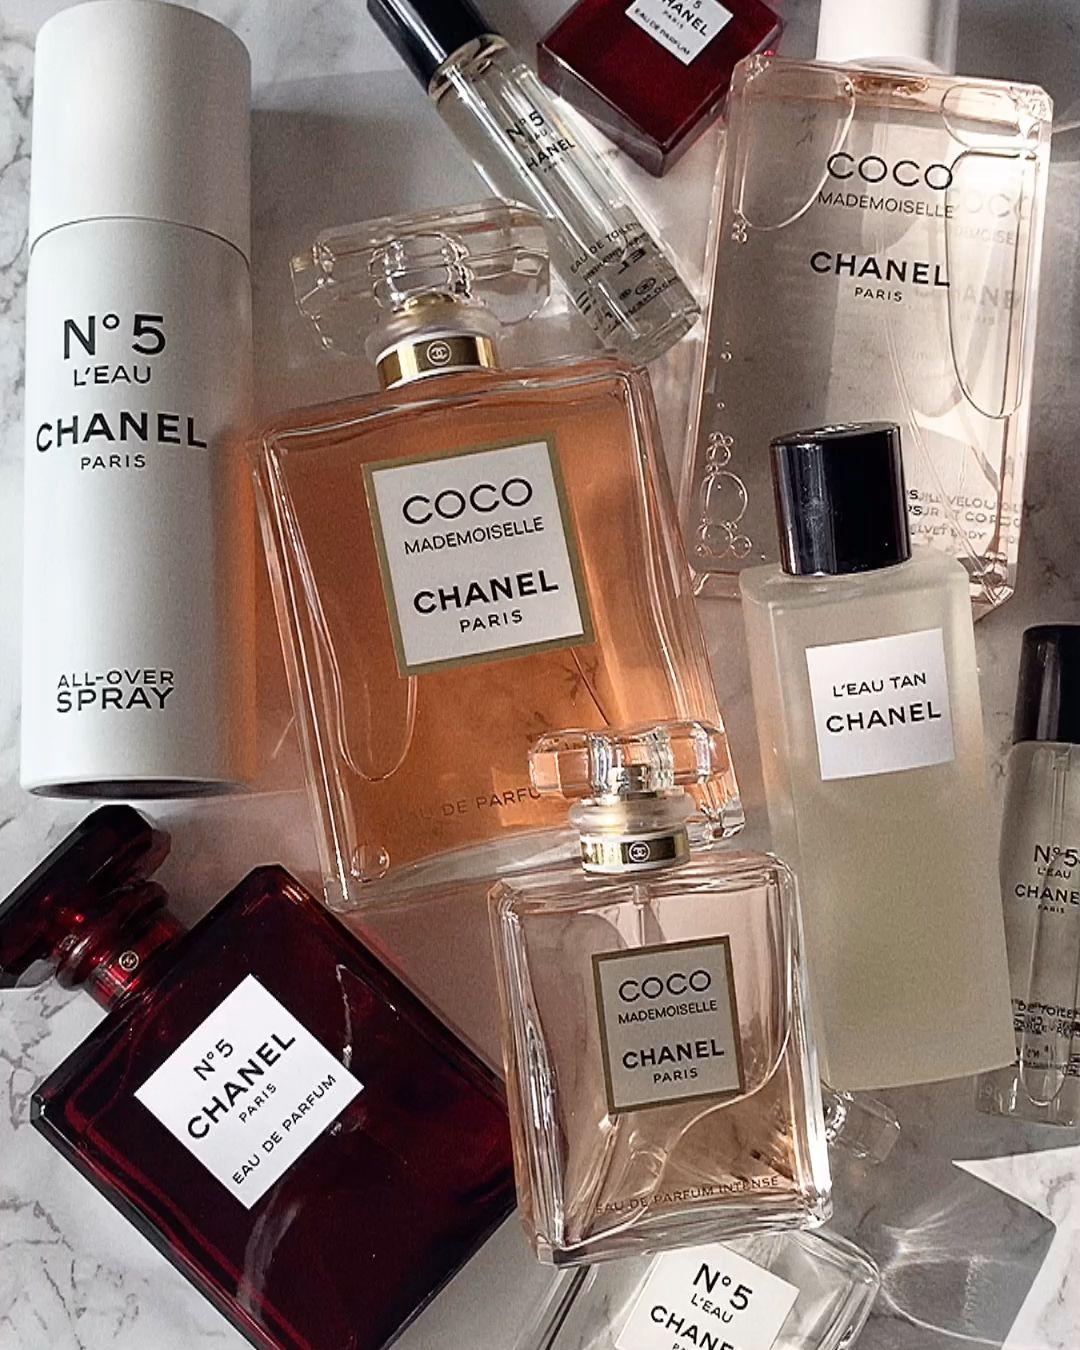 Chanel Coco Mademoiselle Intense Release An Oversized Bottle Woahstyle Video Video Mademoiselle Perfume Perfume Scents Chanel Beauty